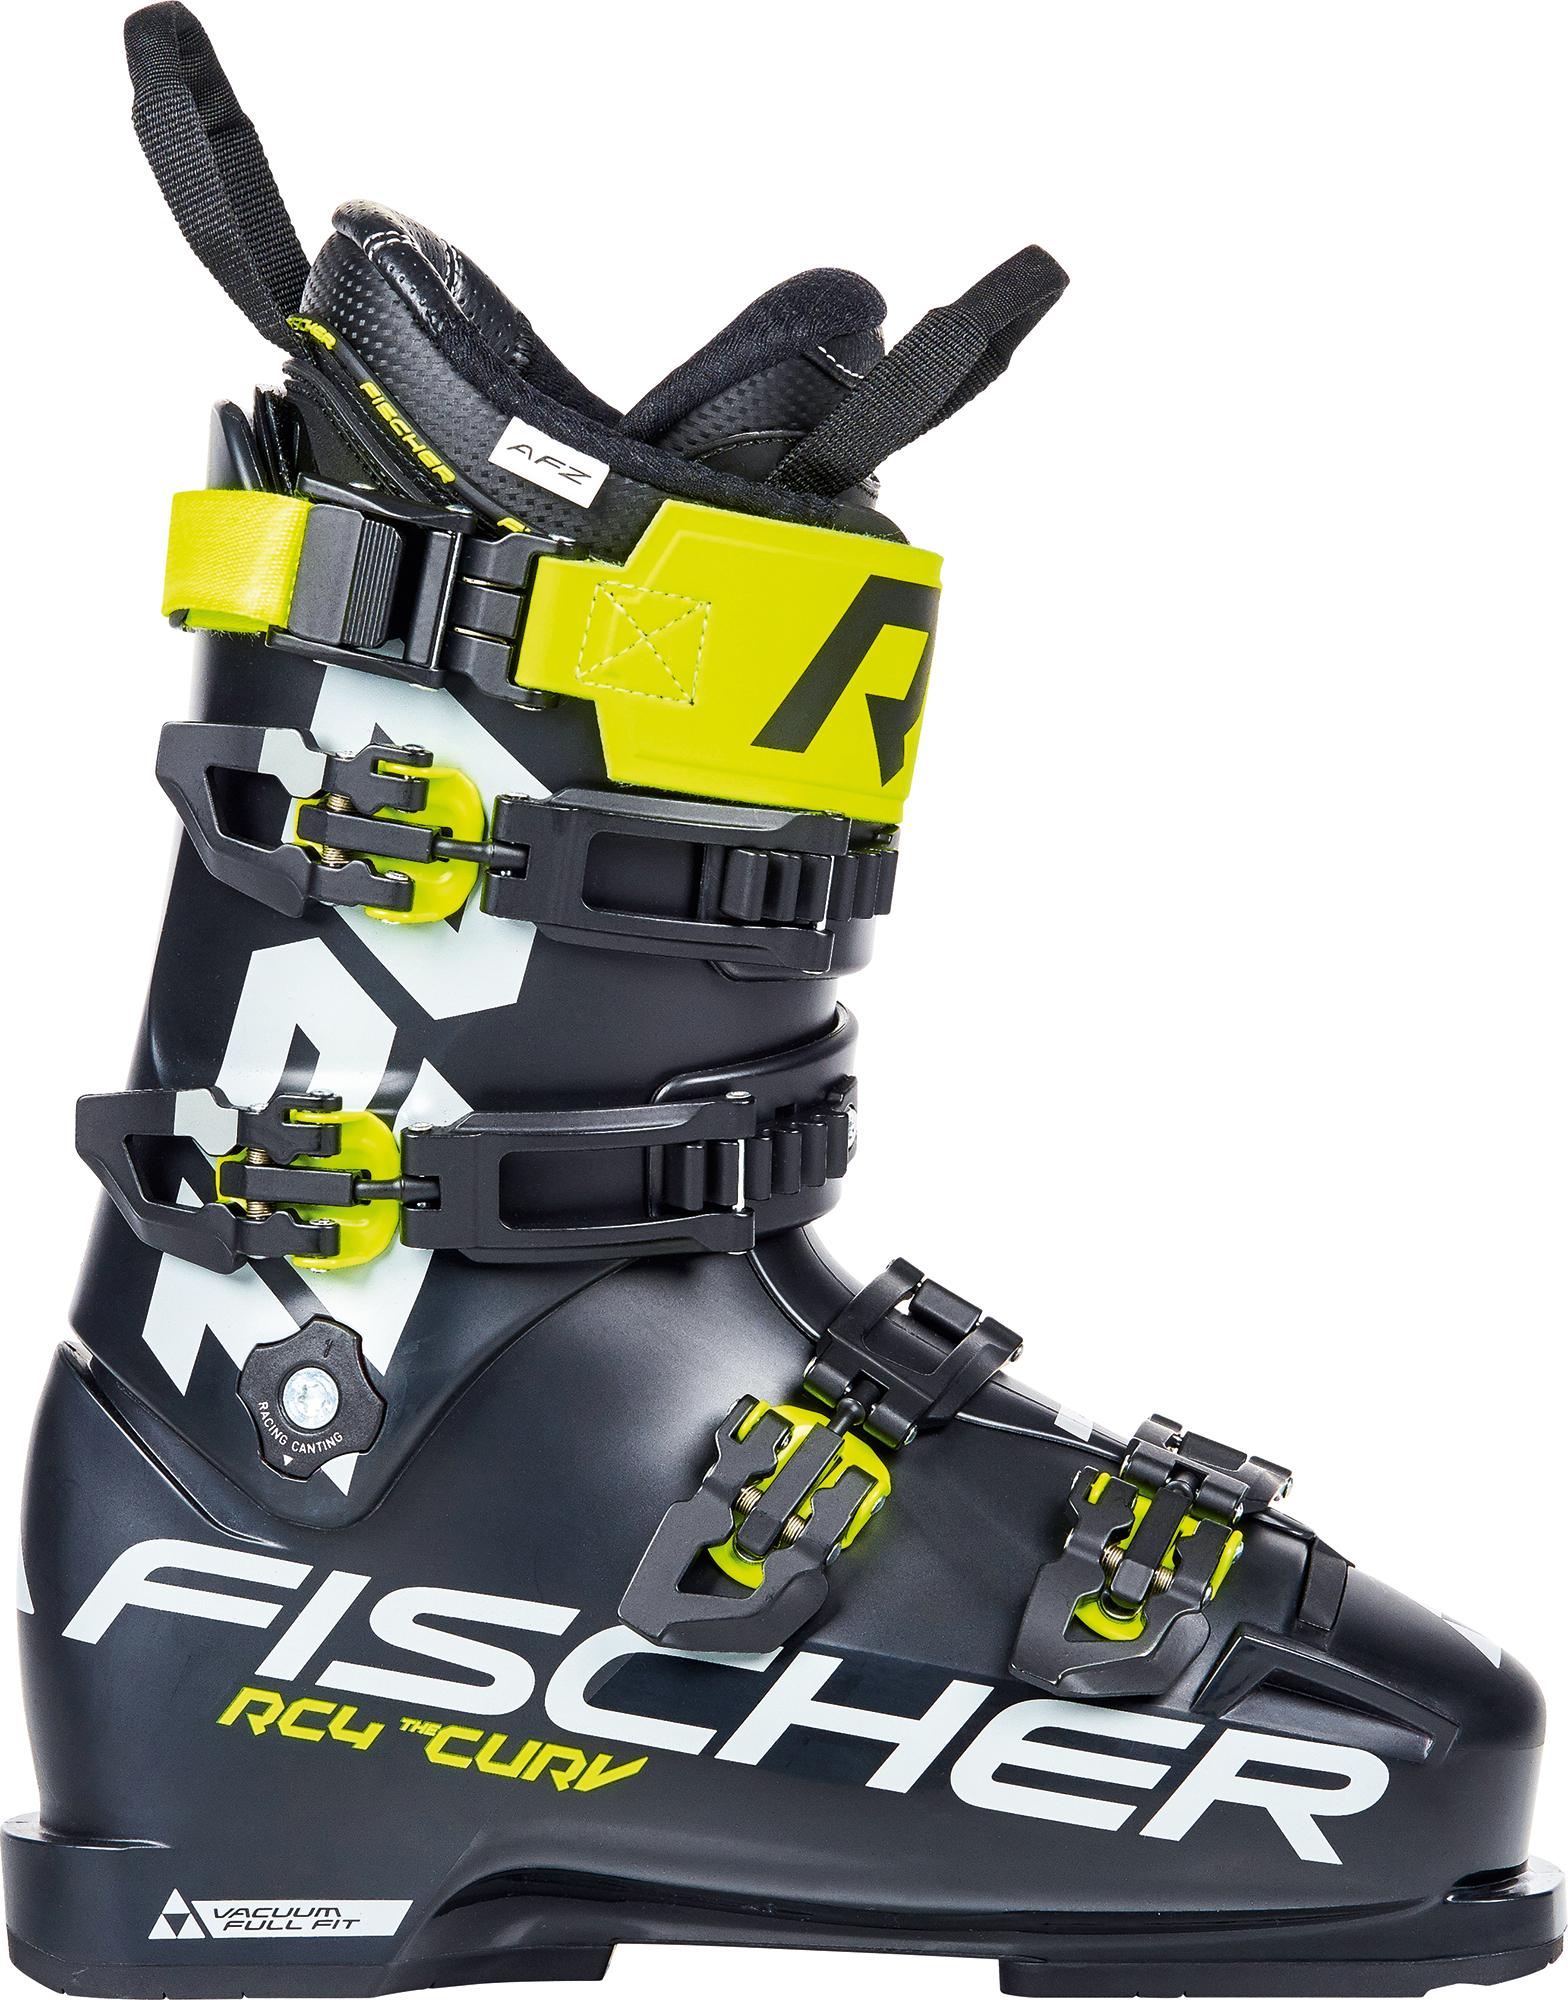 Fischer Ботинки горнолыжные RC4 THE CURV 120 VFF, размер 29,5 см